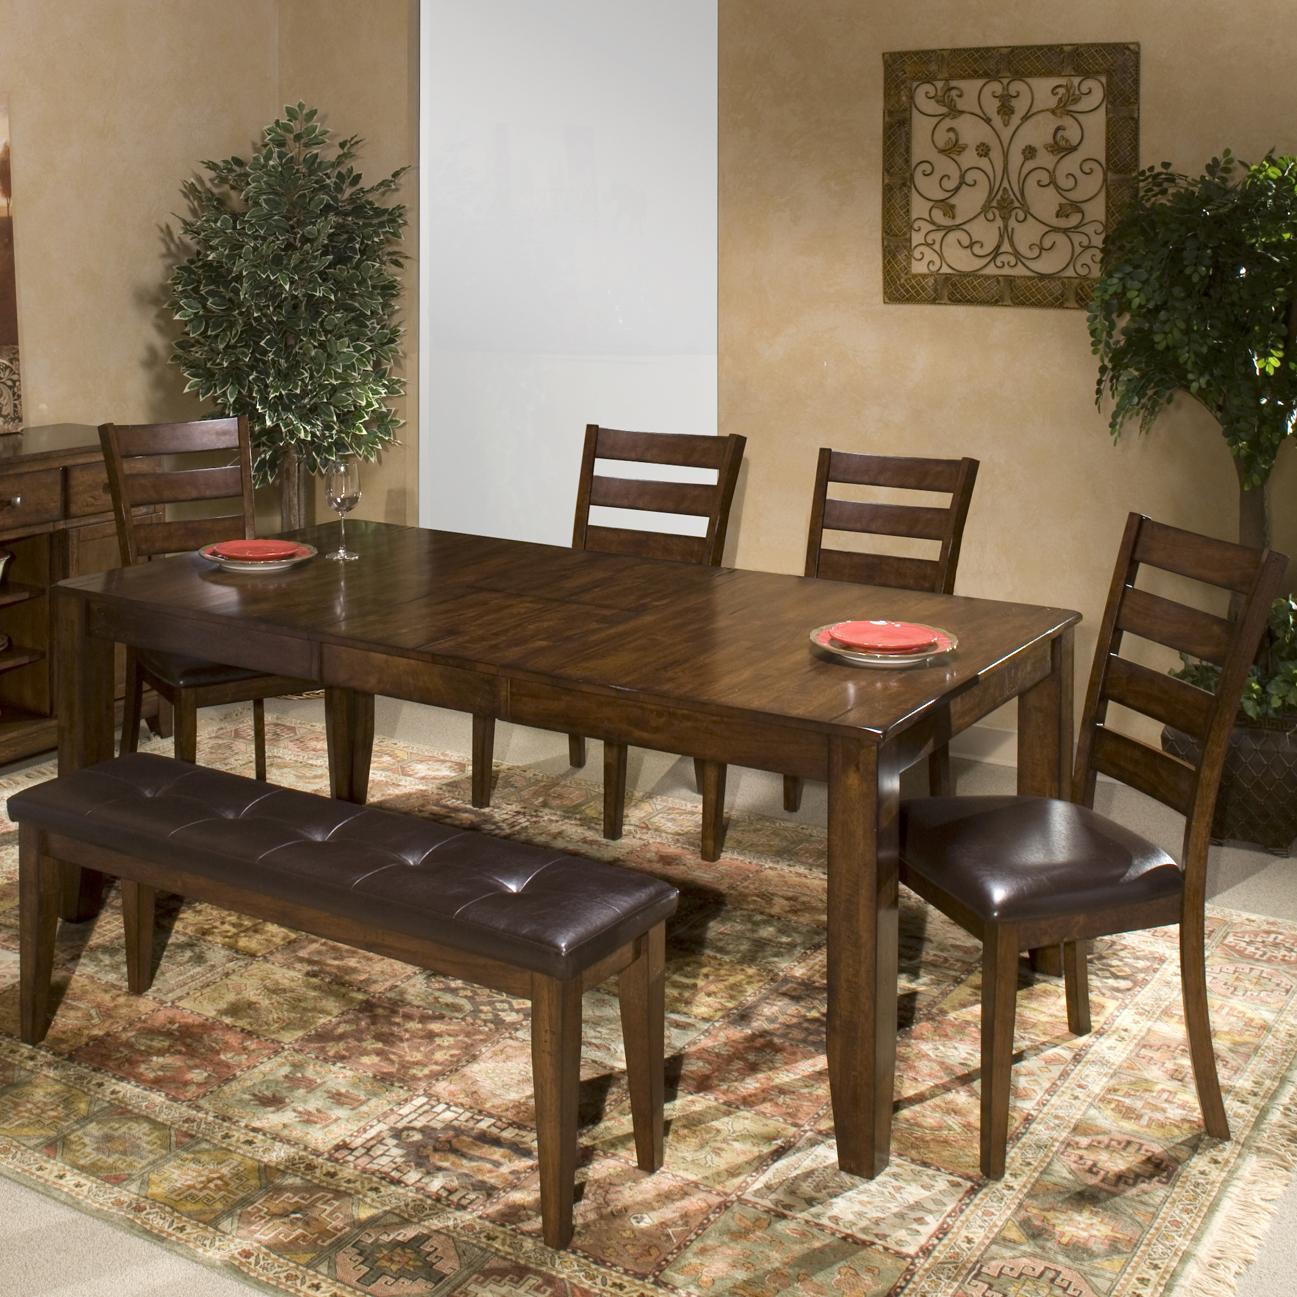 6 Piece Mango Wood Dining Room Set by Intercon